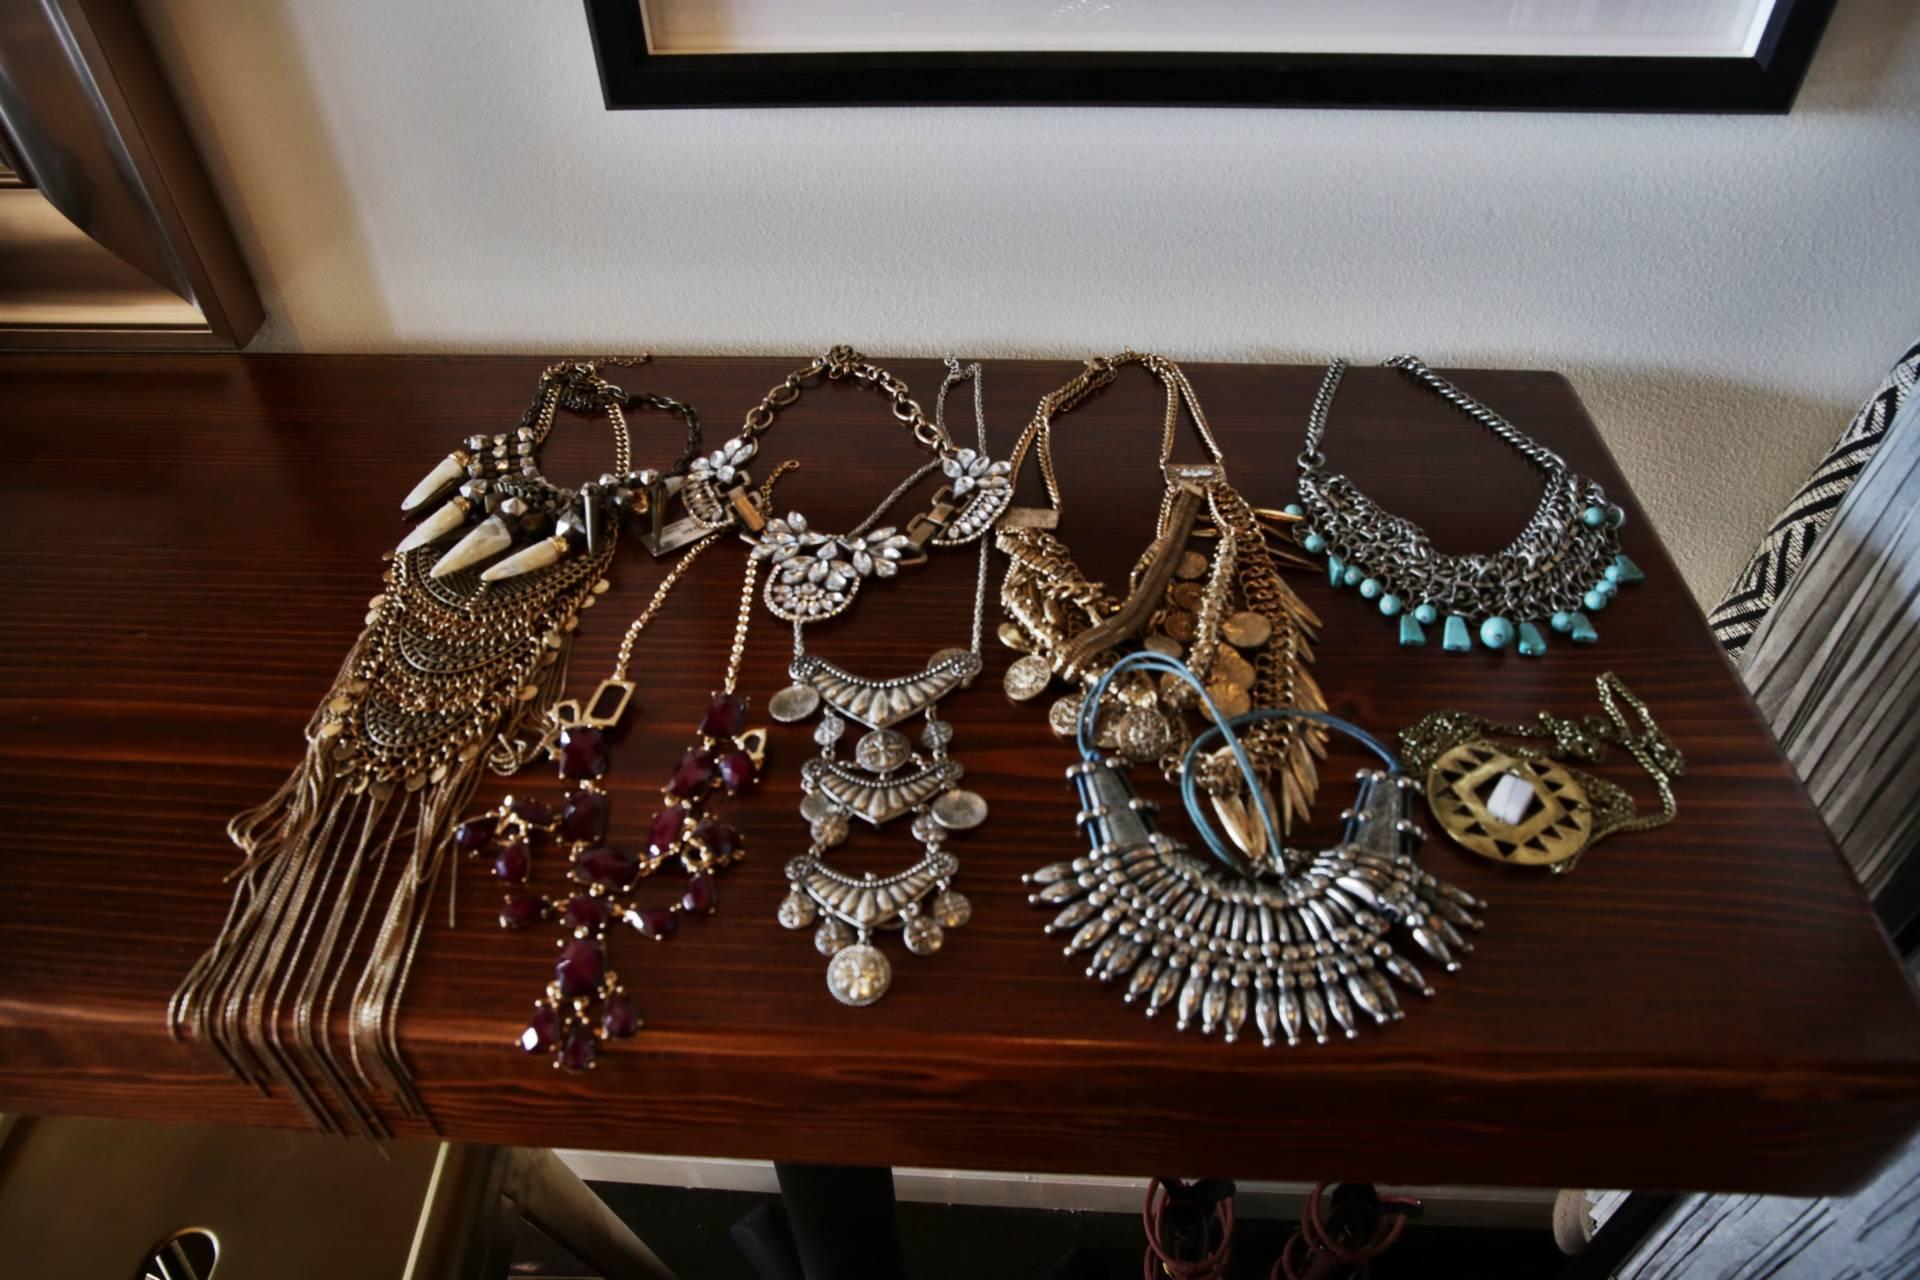 fashion-blogger-closet-sale-teaoxics-re-cap- jewlery